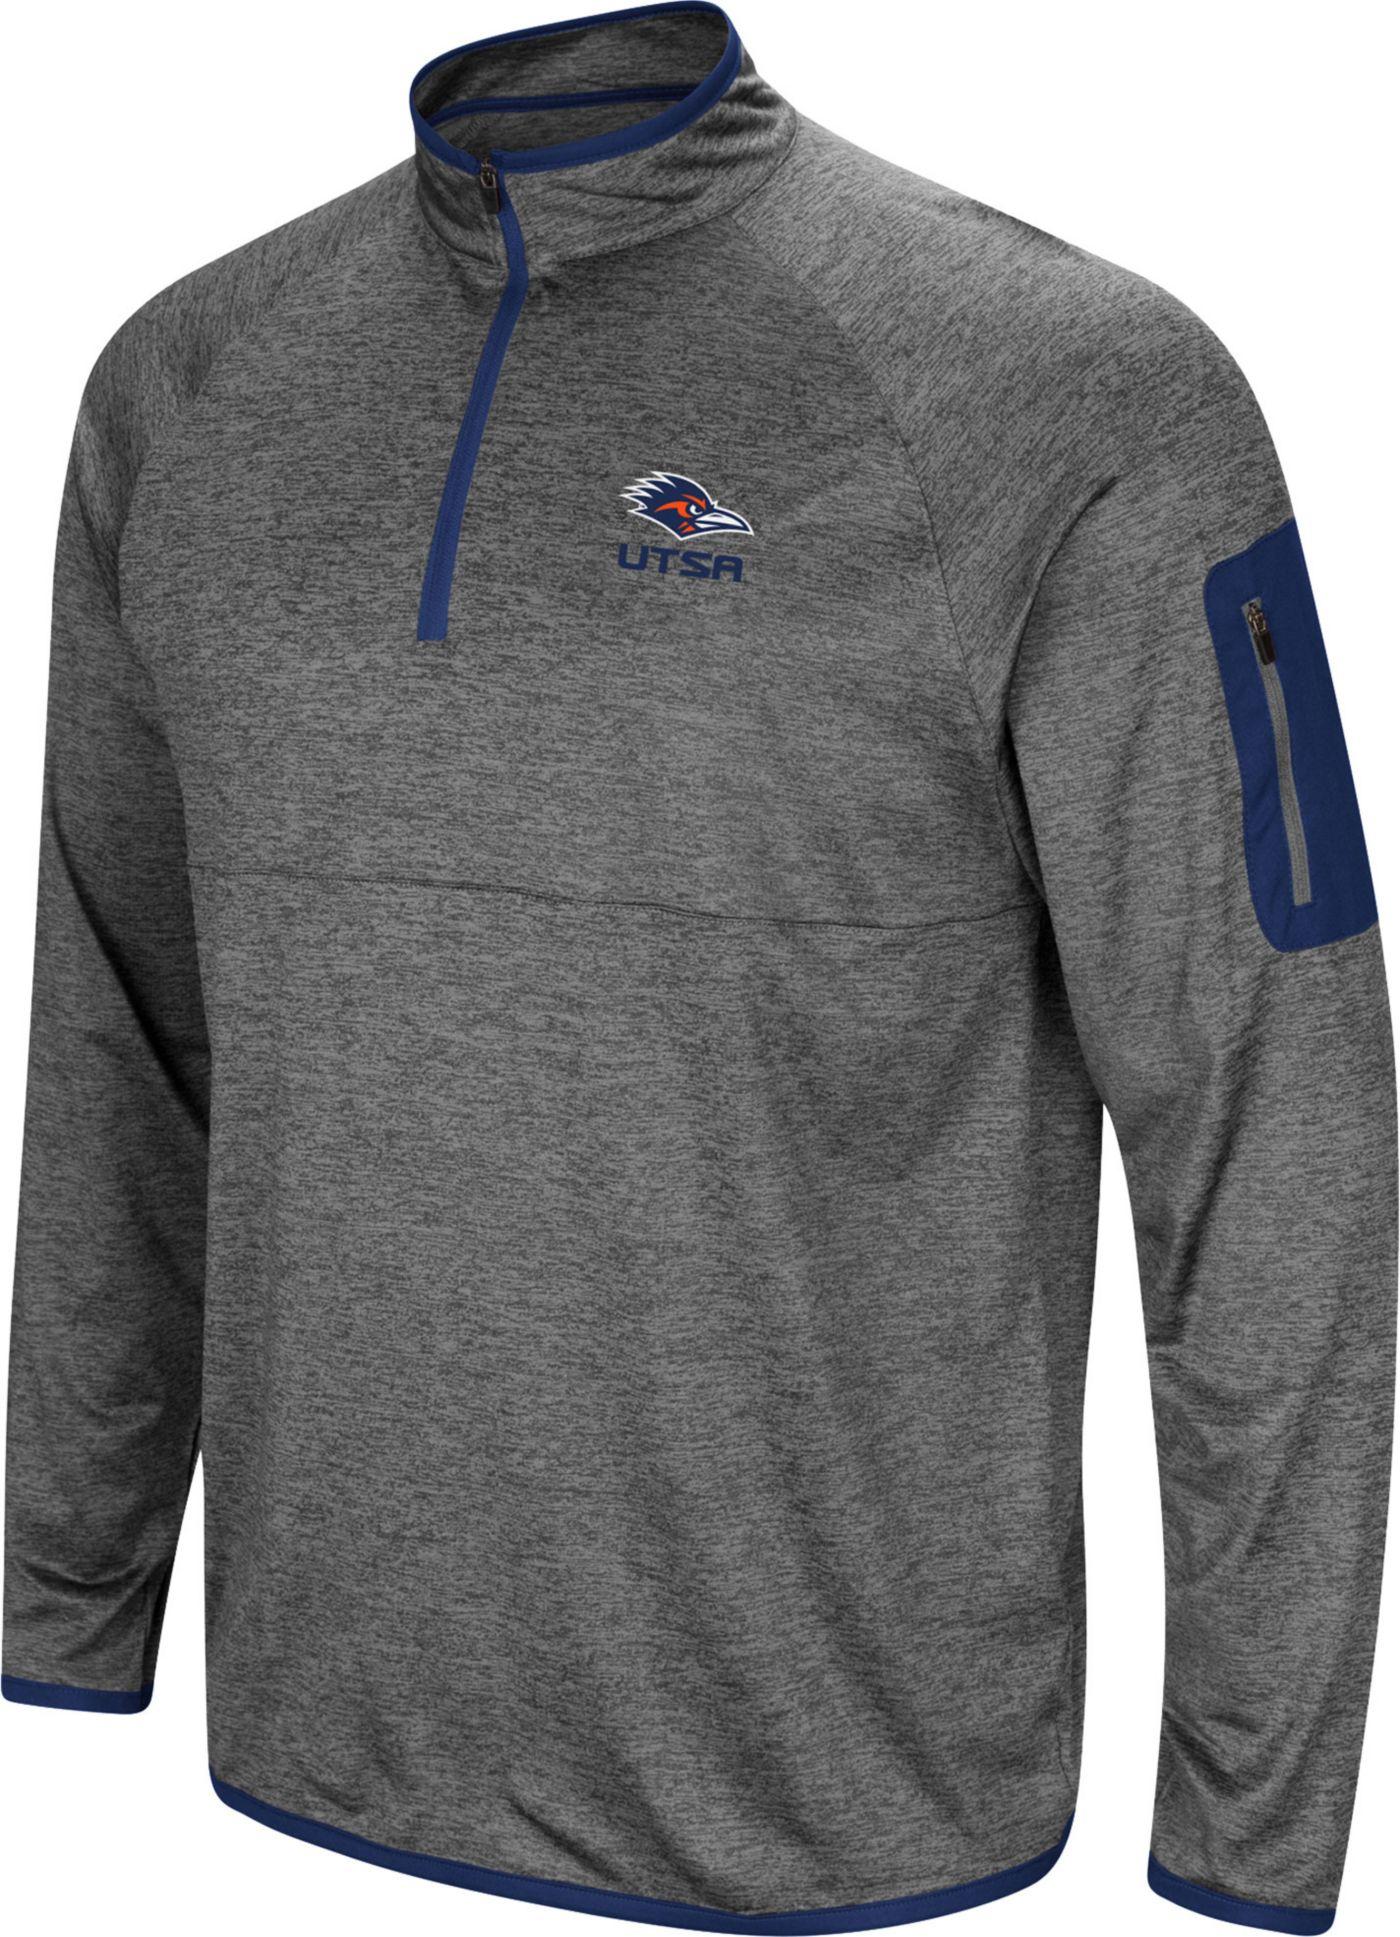 Colosseum Men's UT San Antonio Roadrunners Grey Indus River Quarter-Zip Shirt